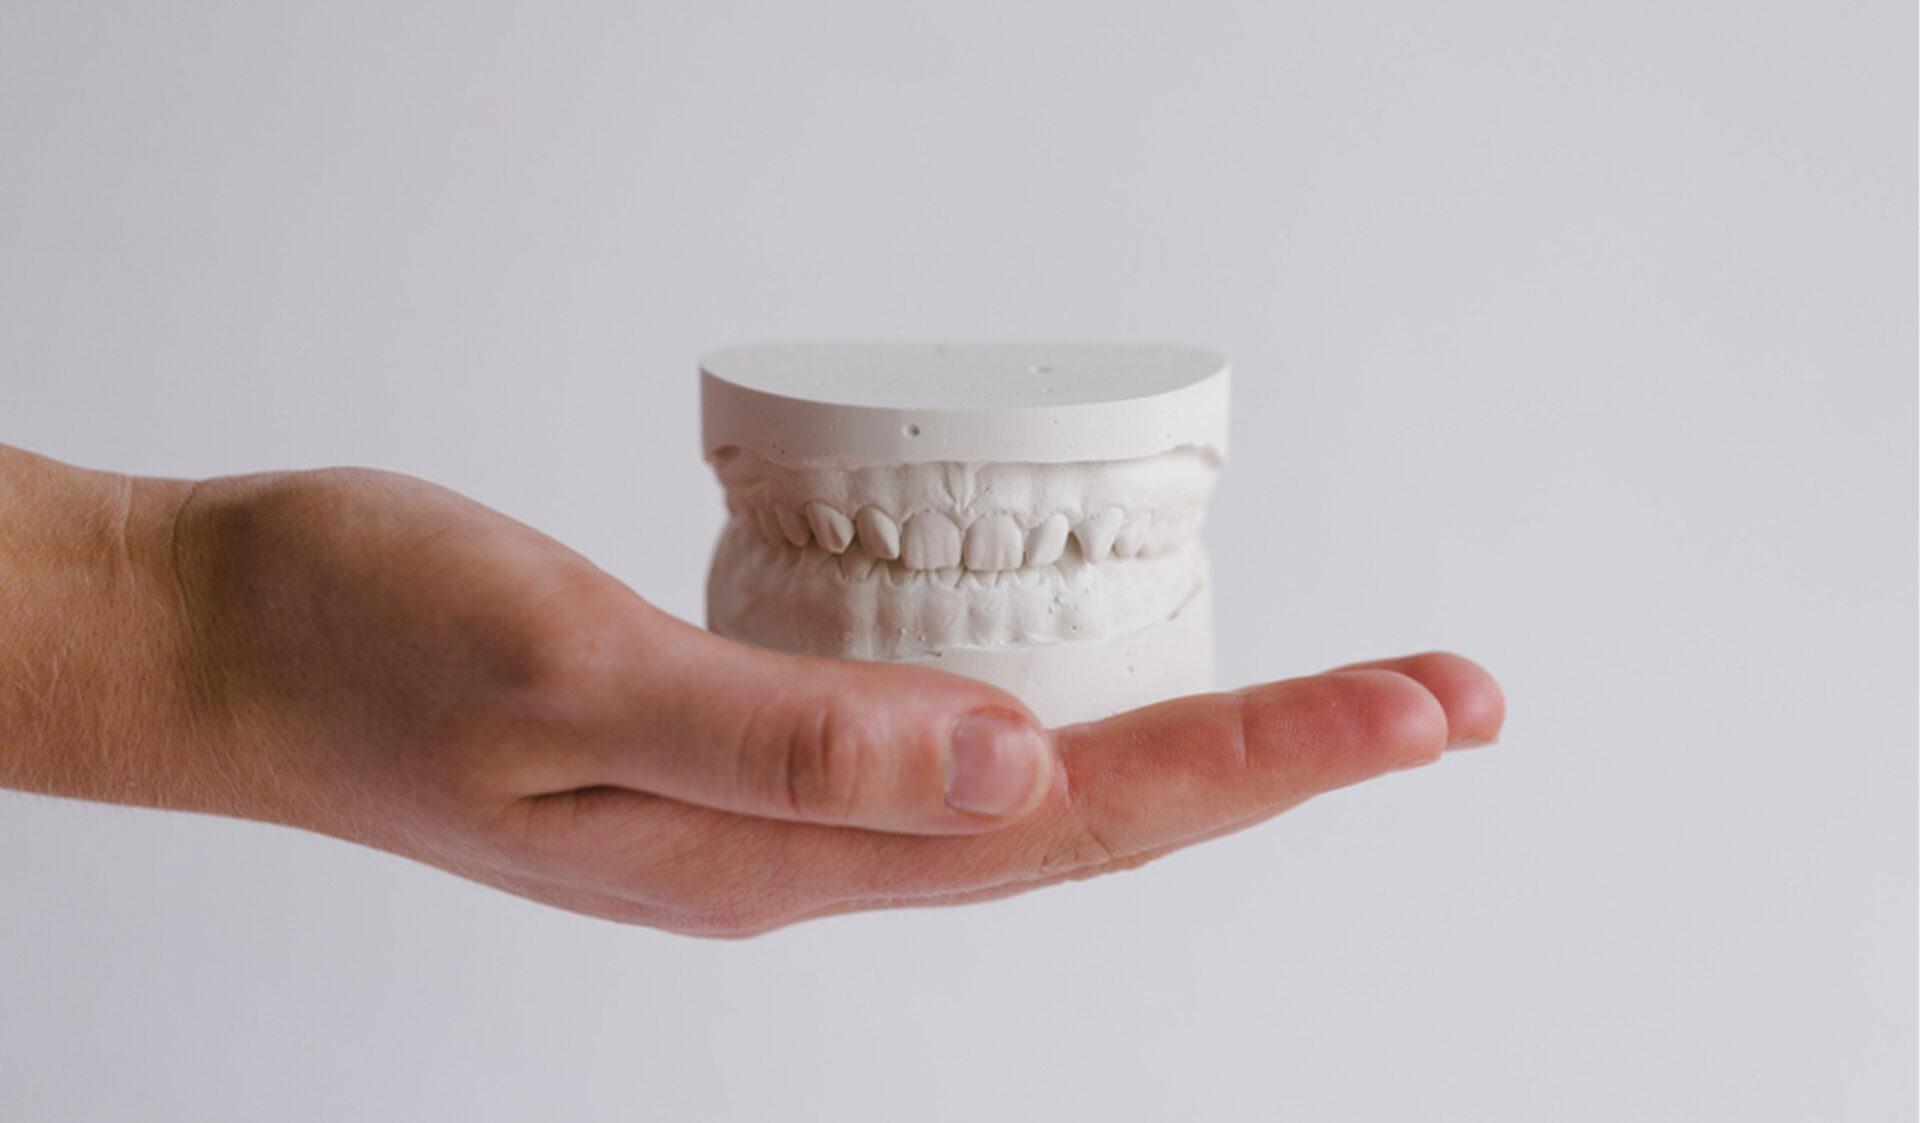 encinitas-dental-designs-services-tmj-treatment